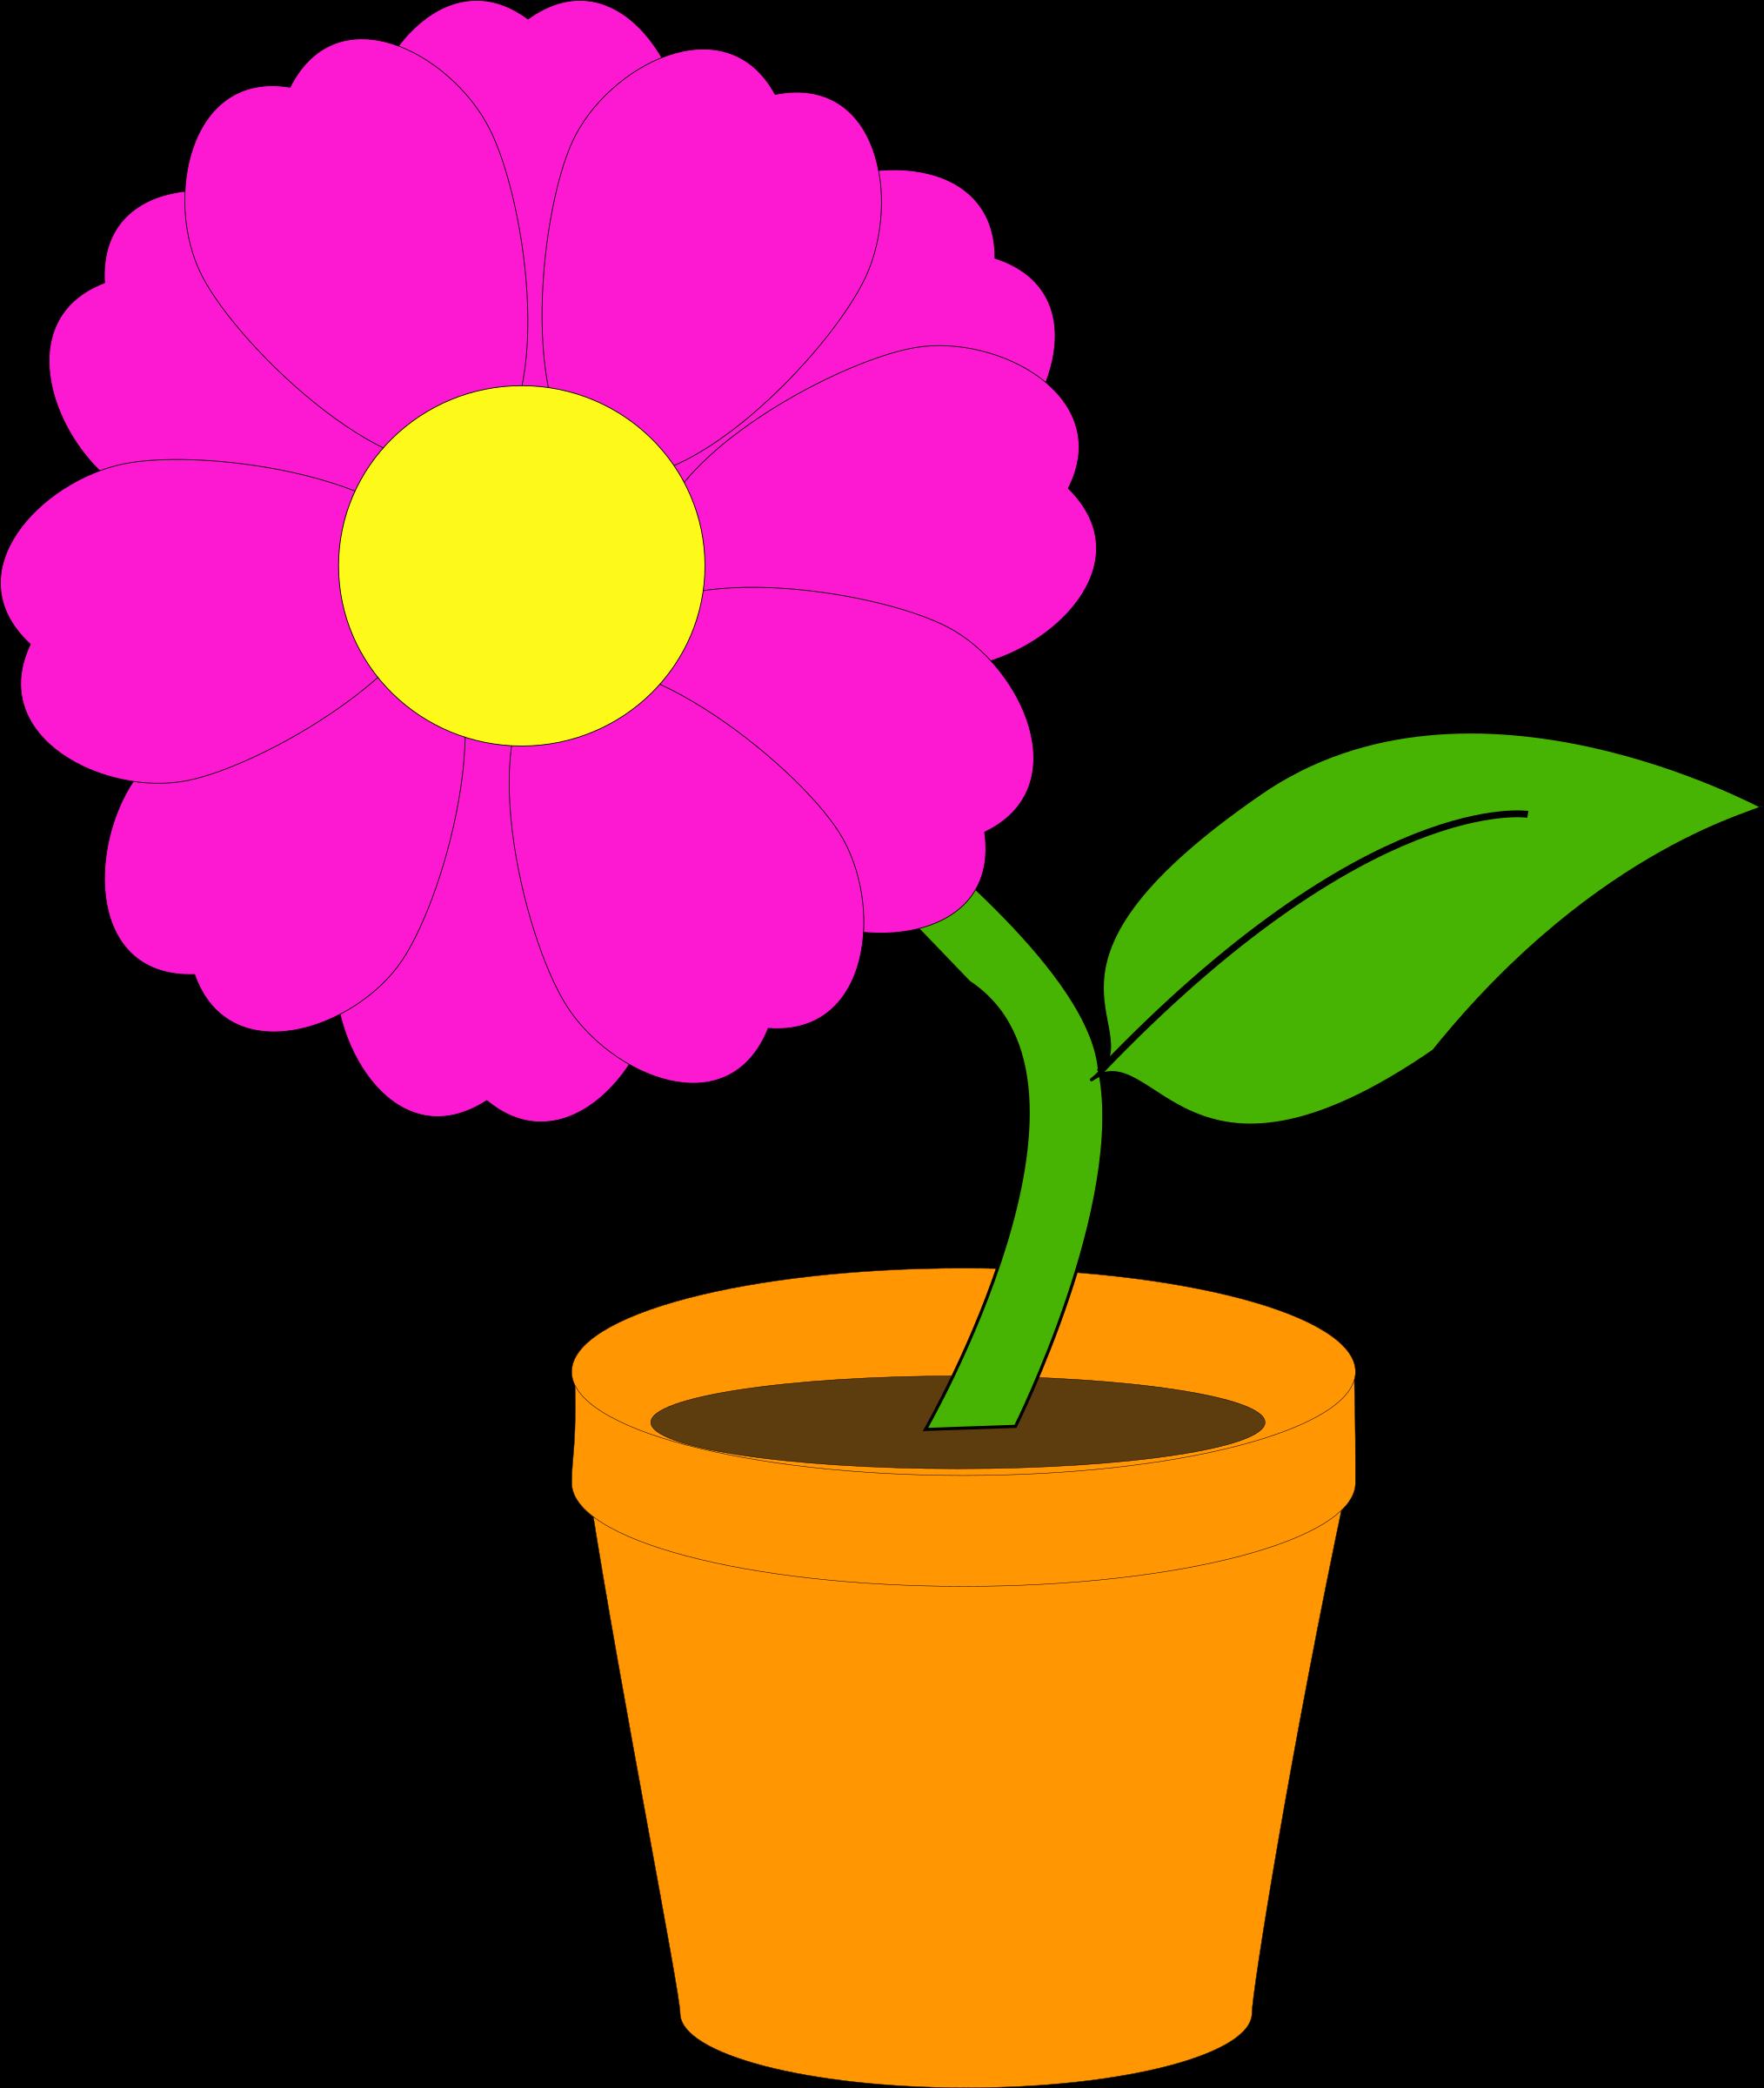 R clipart flower. Flowerandpot daniel ste big